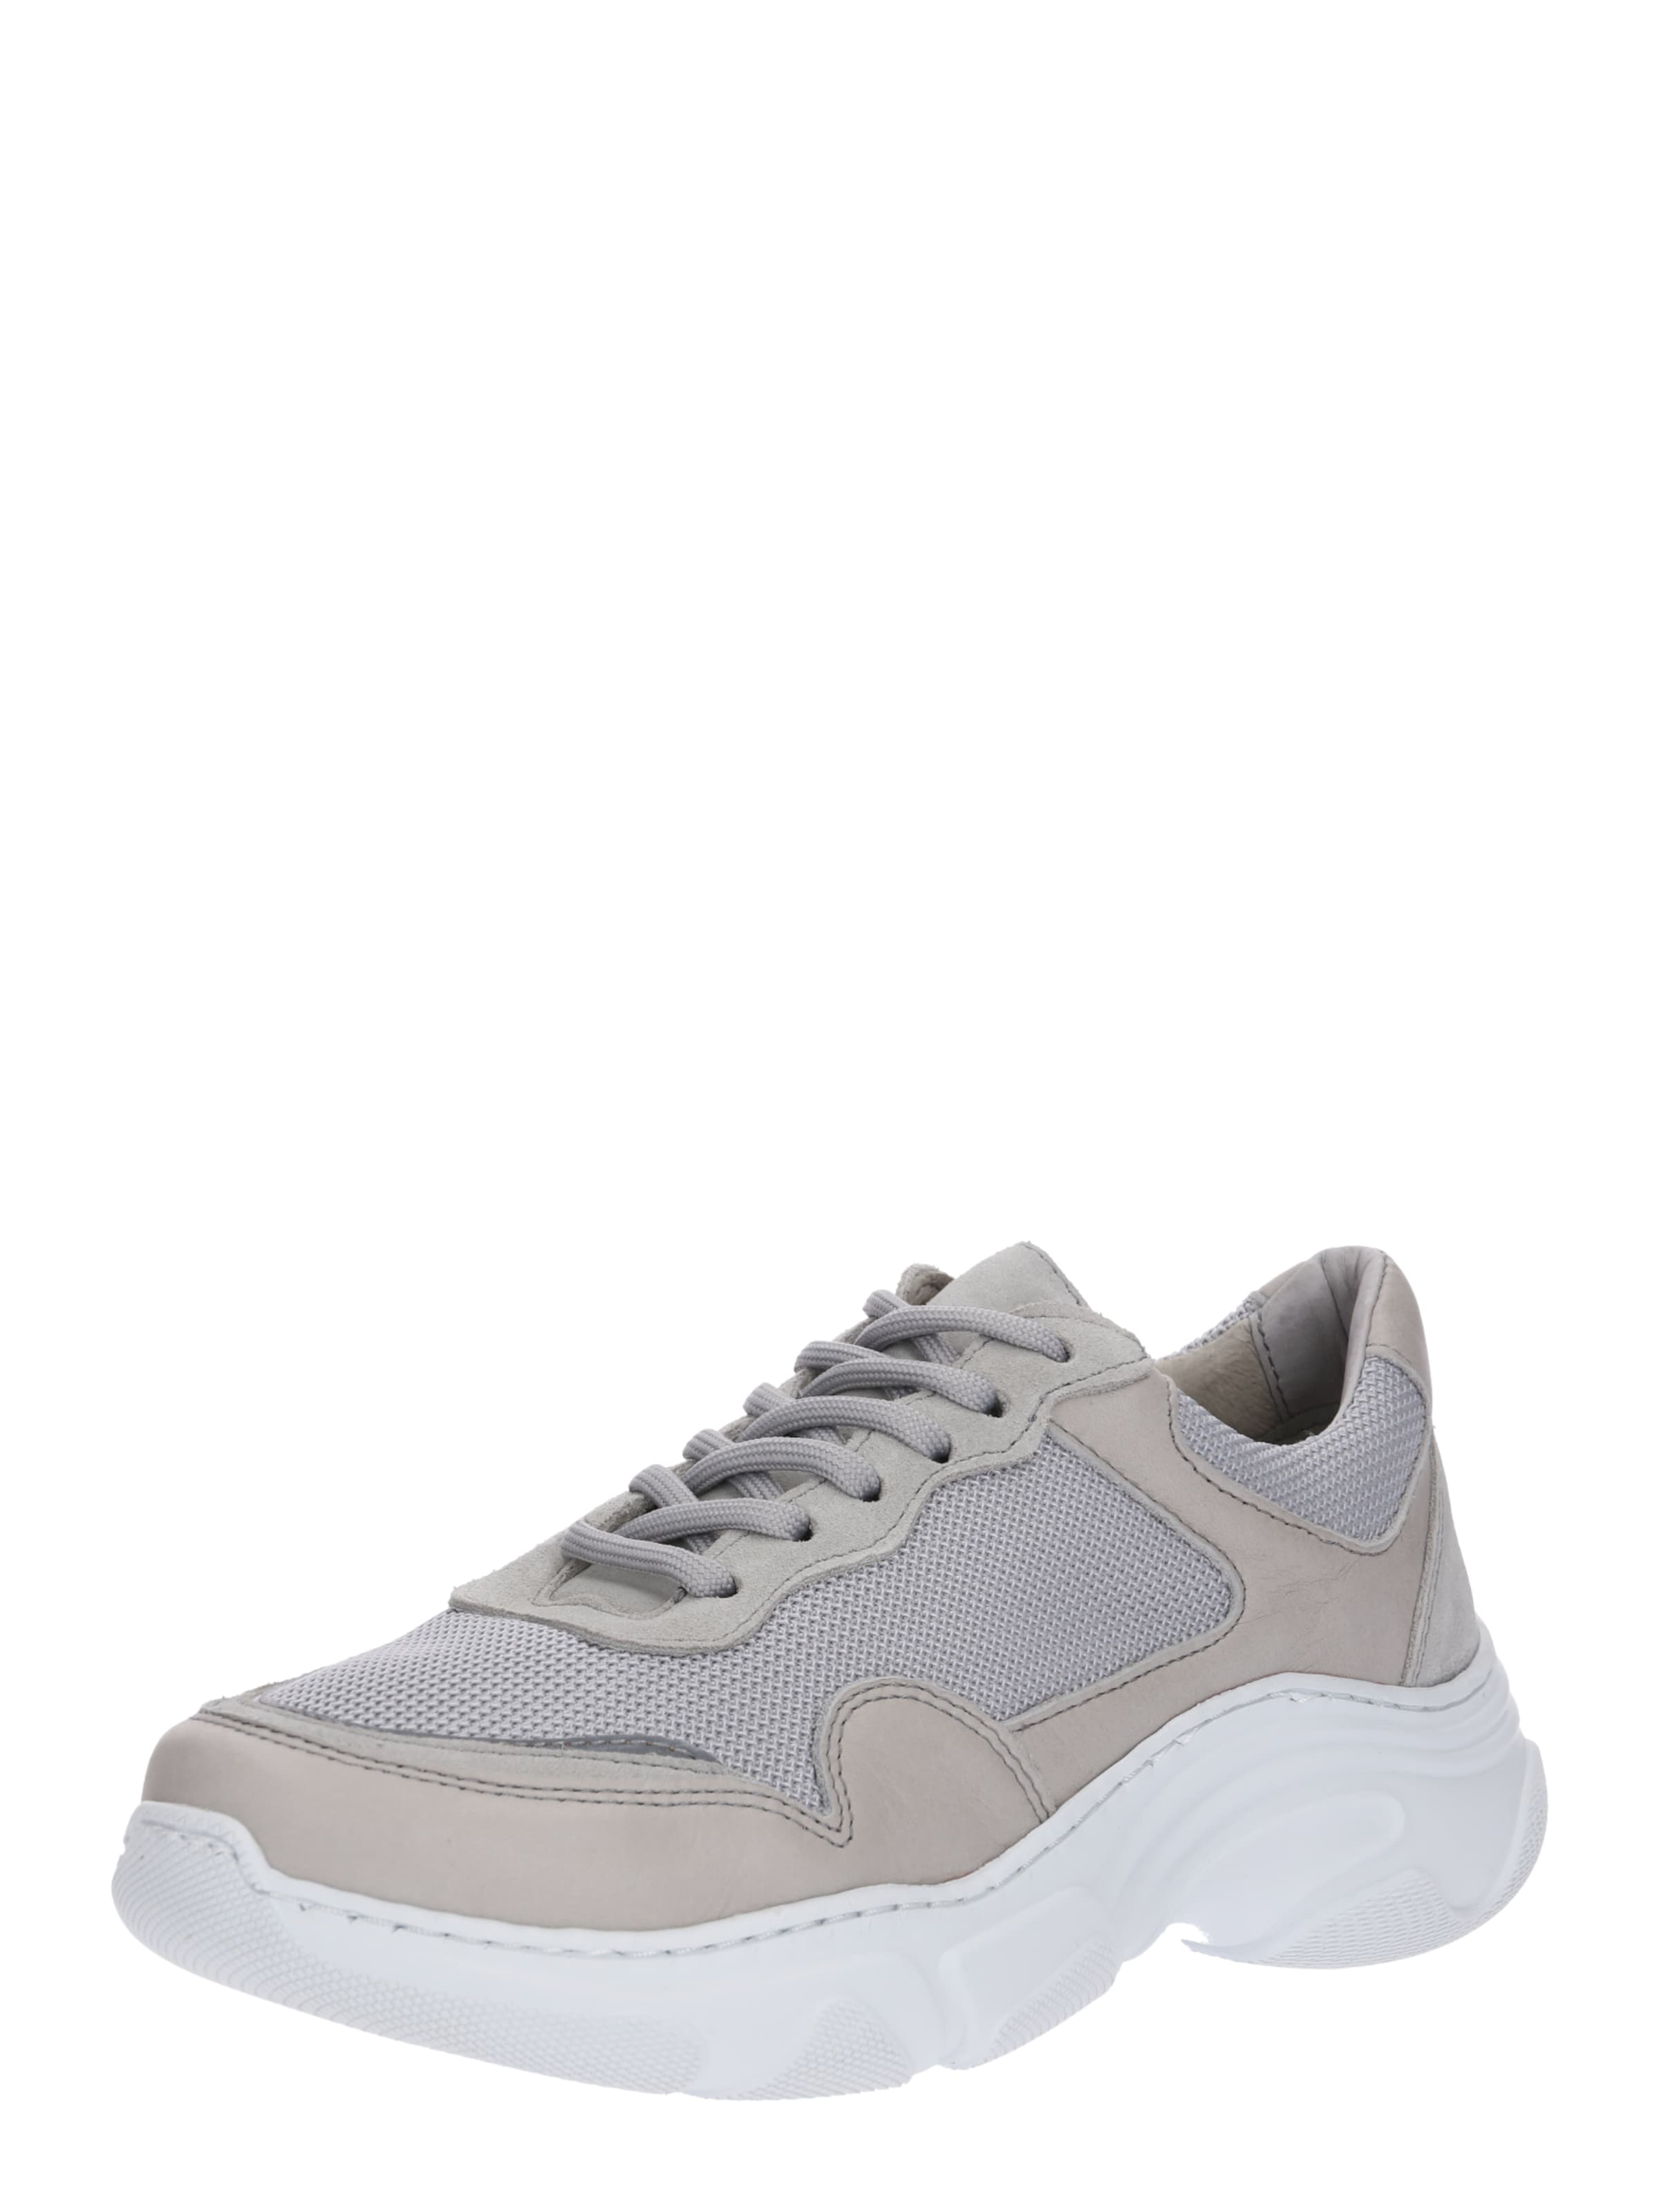 'flex' Garment Project Sneaker In TaupeHellgrau D2EH9WIY